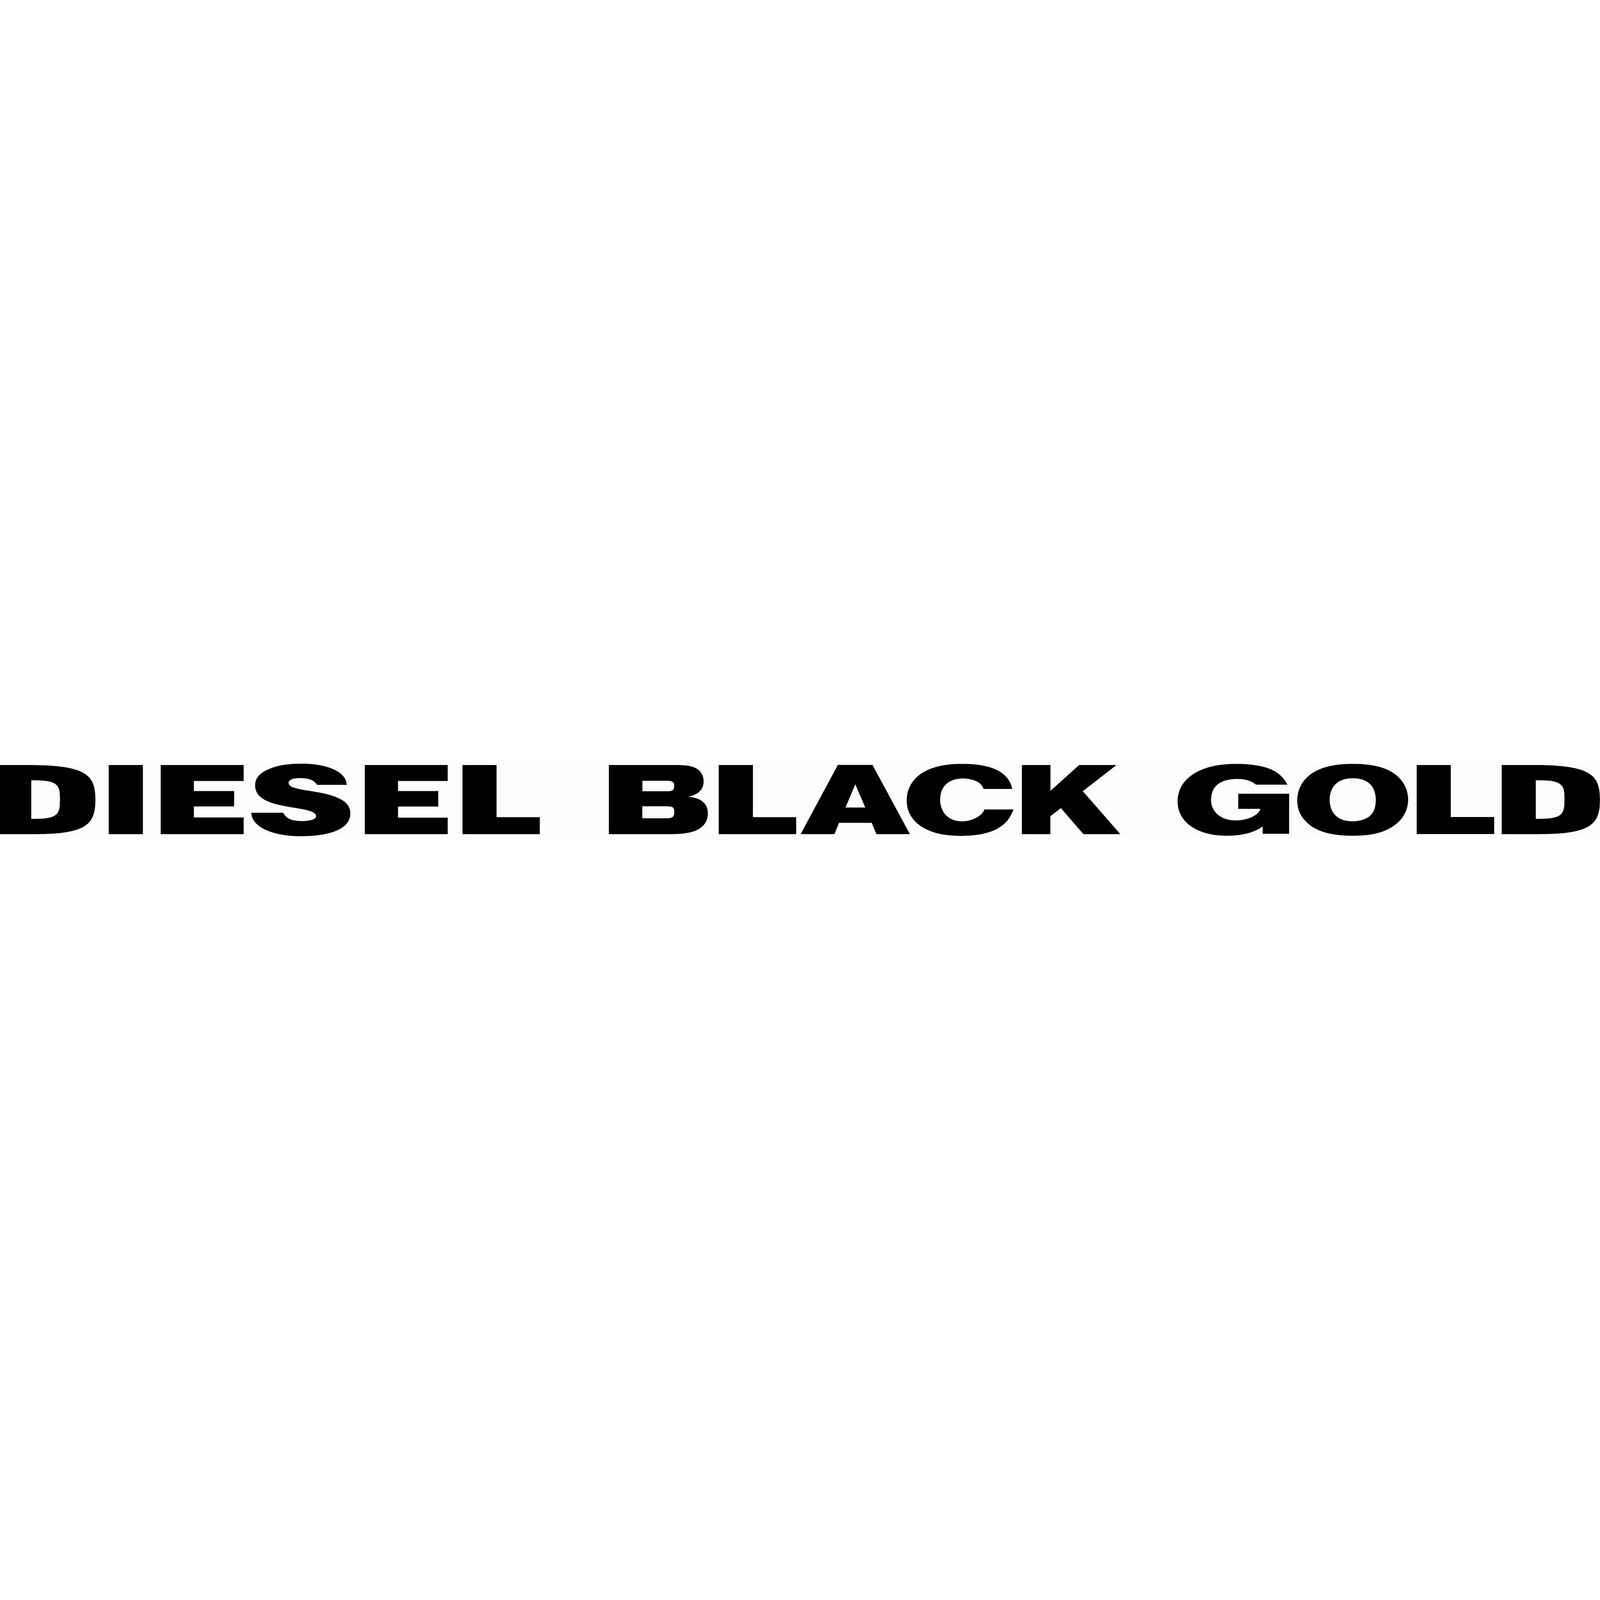 DIESEL BLACK GOLD (Изображение 1)